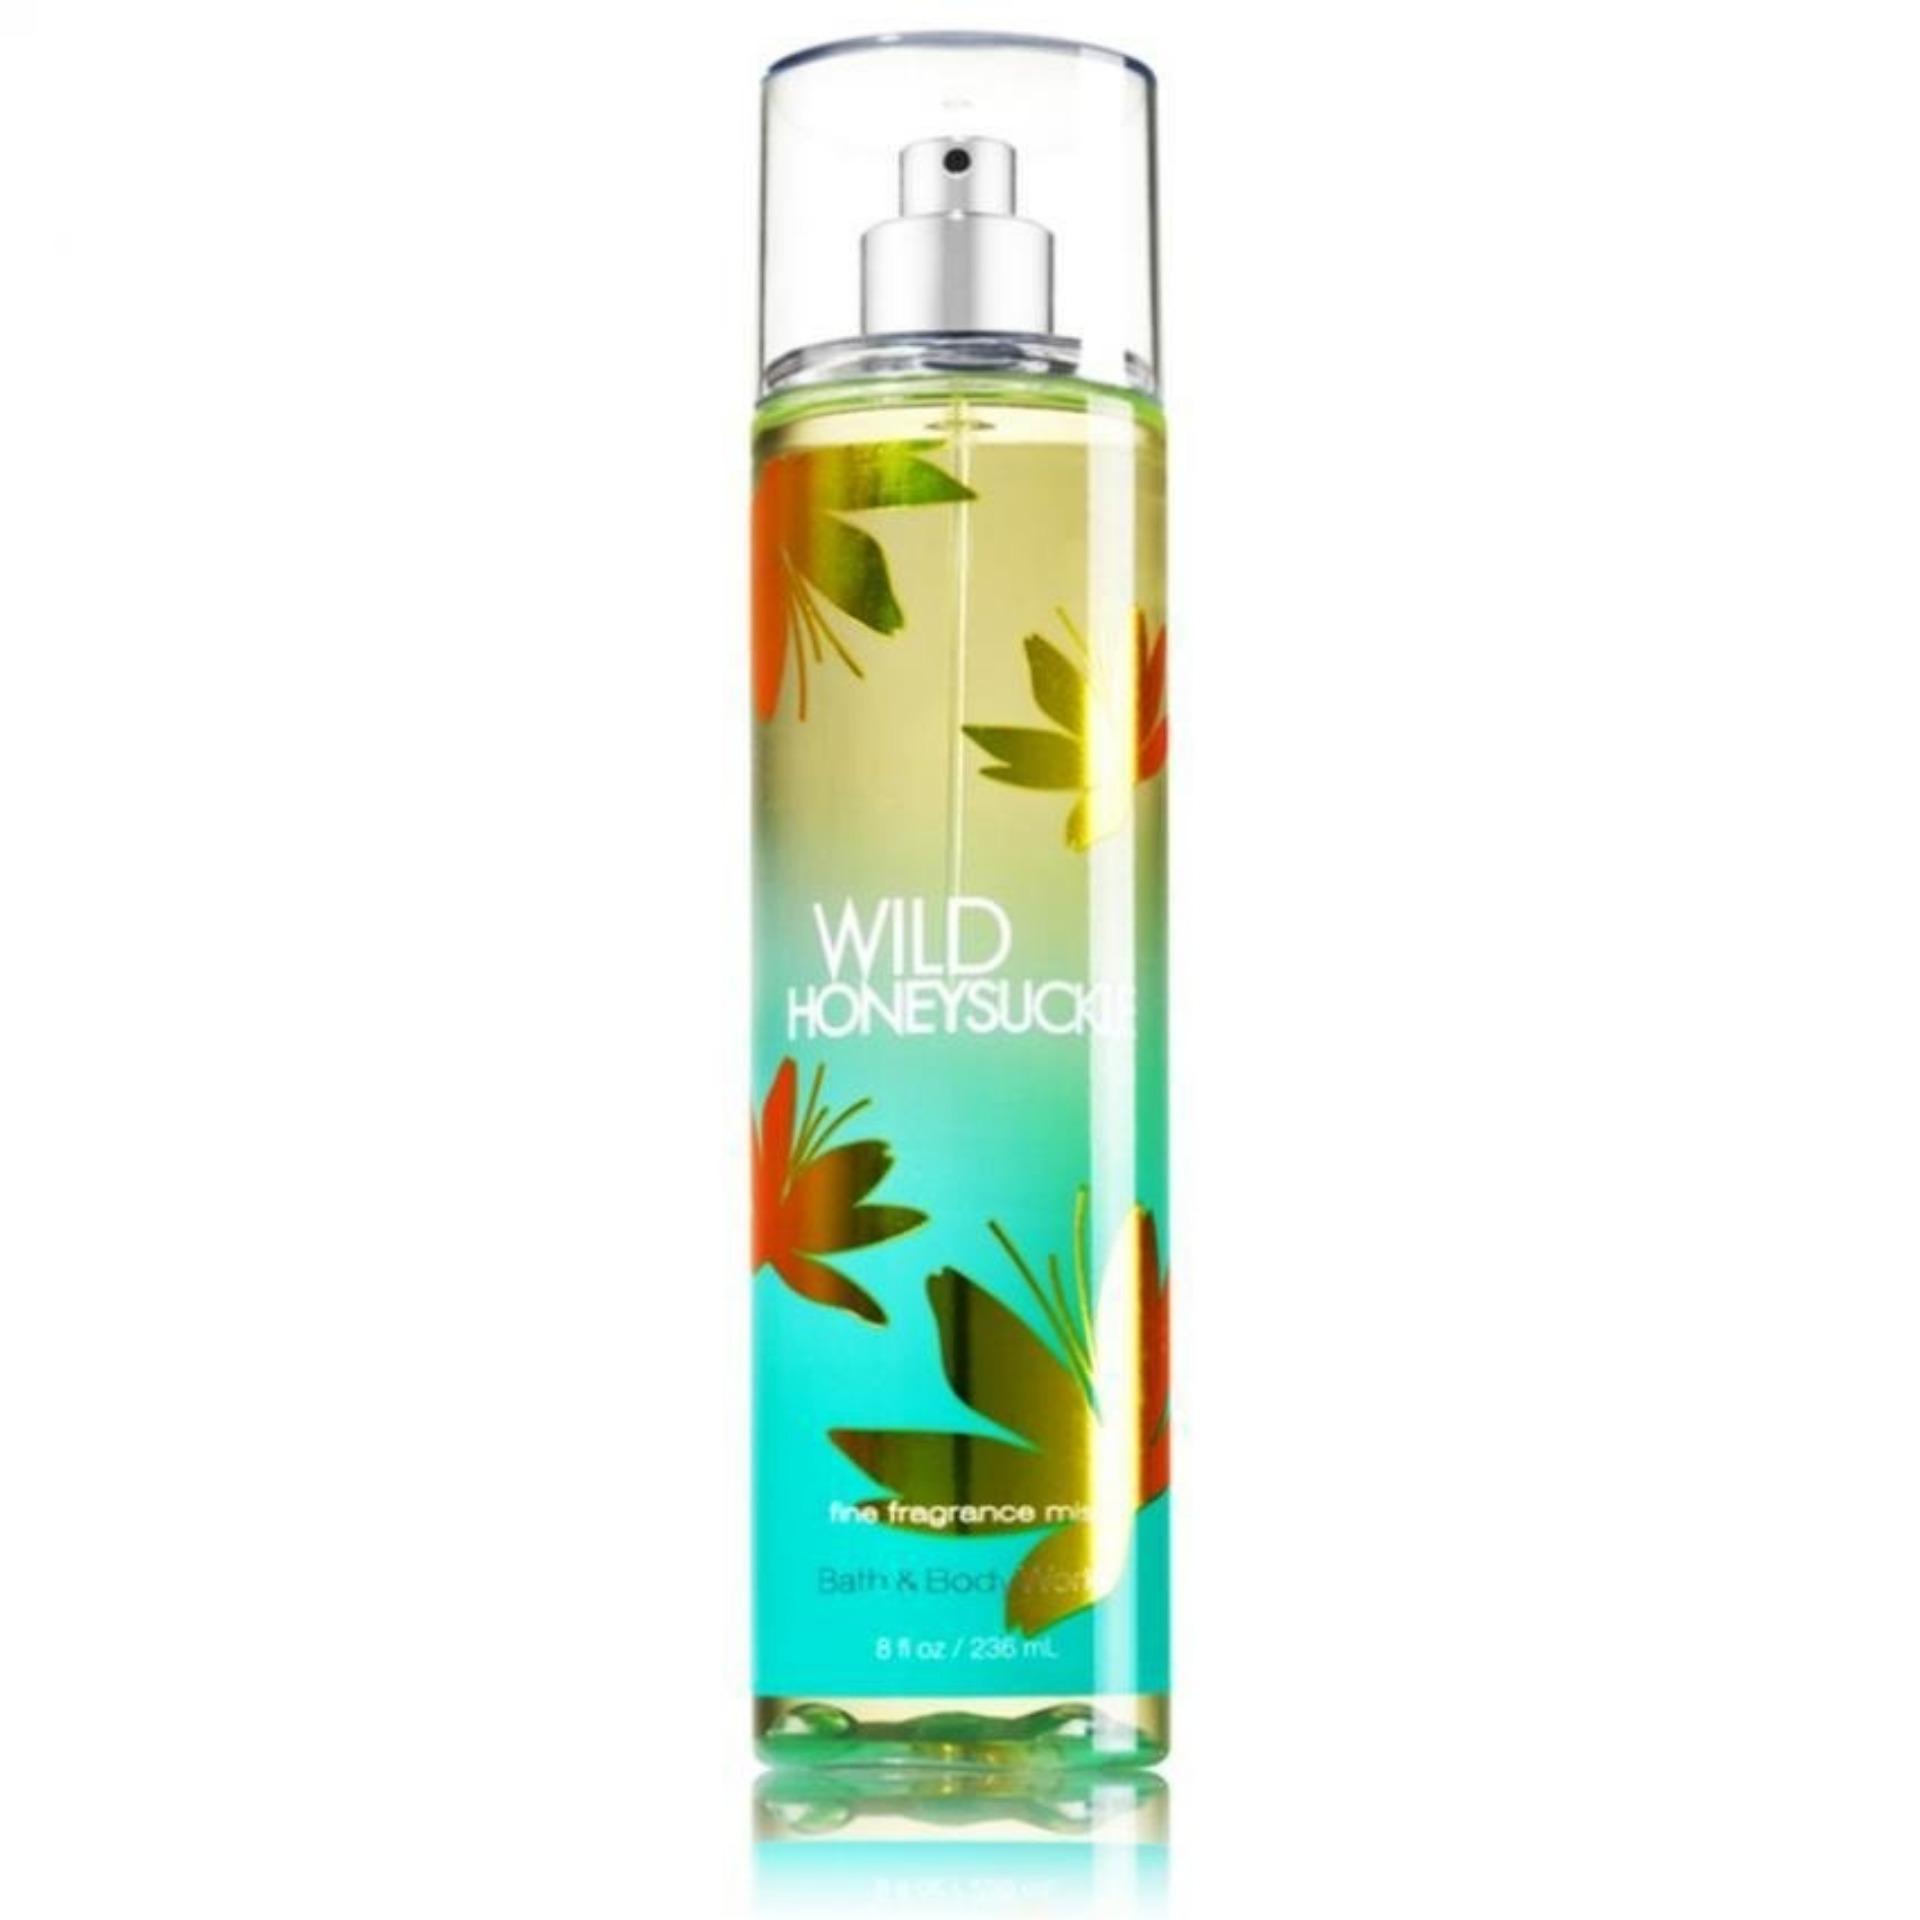 Bath and Body Works Wild Honeysuckle Fine Fragrance Mist 236mL